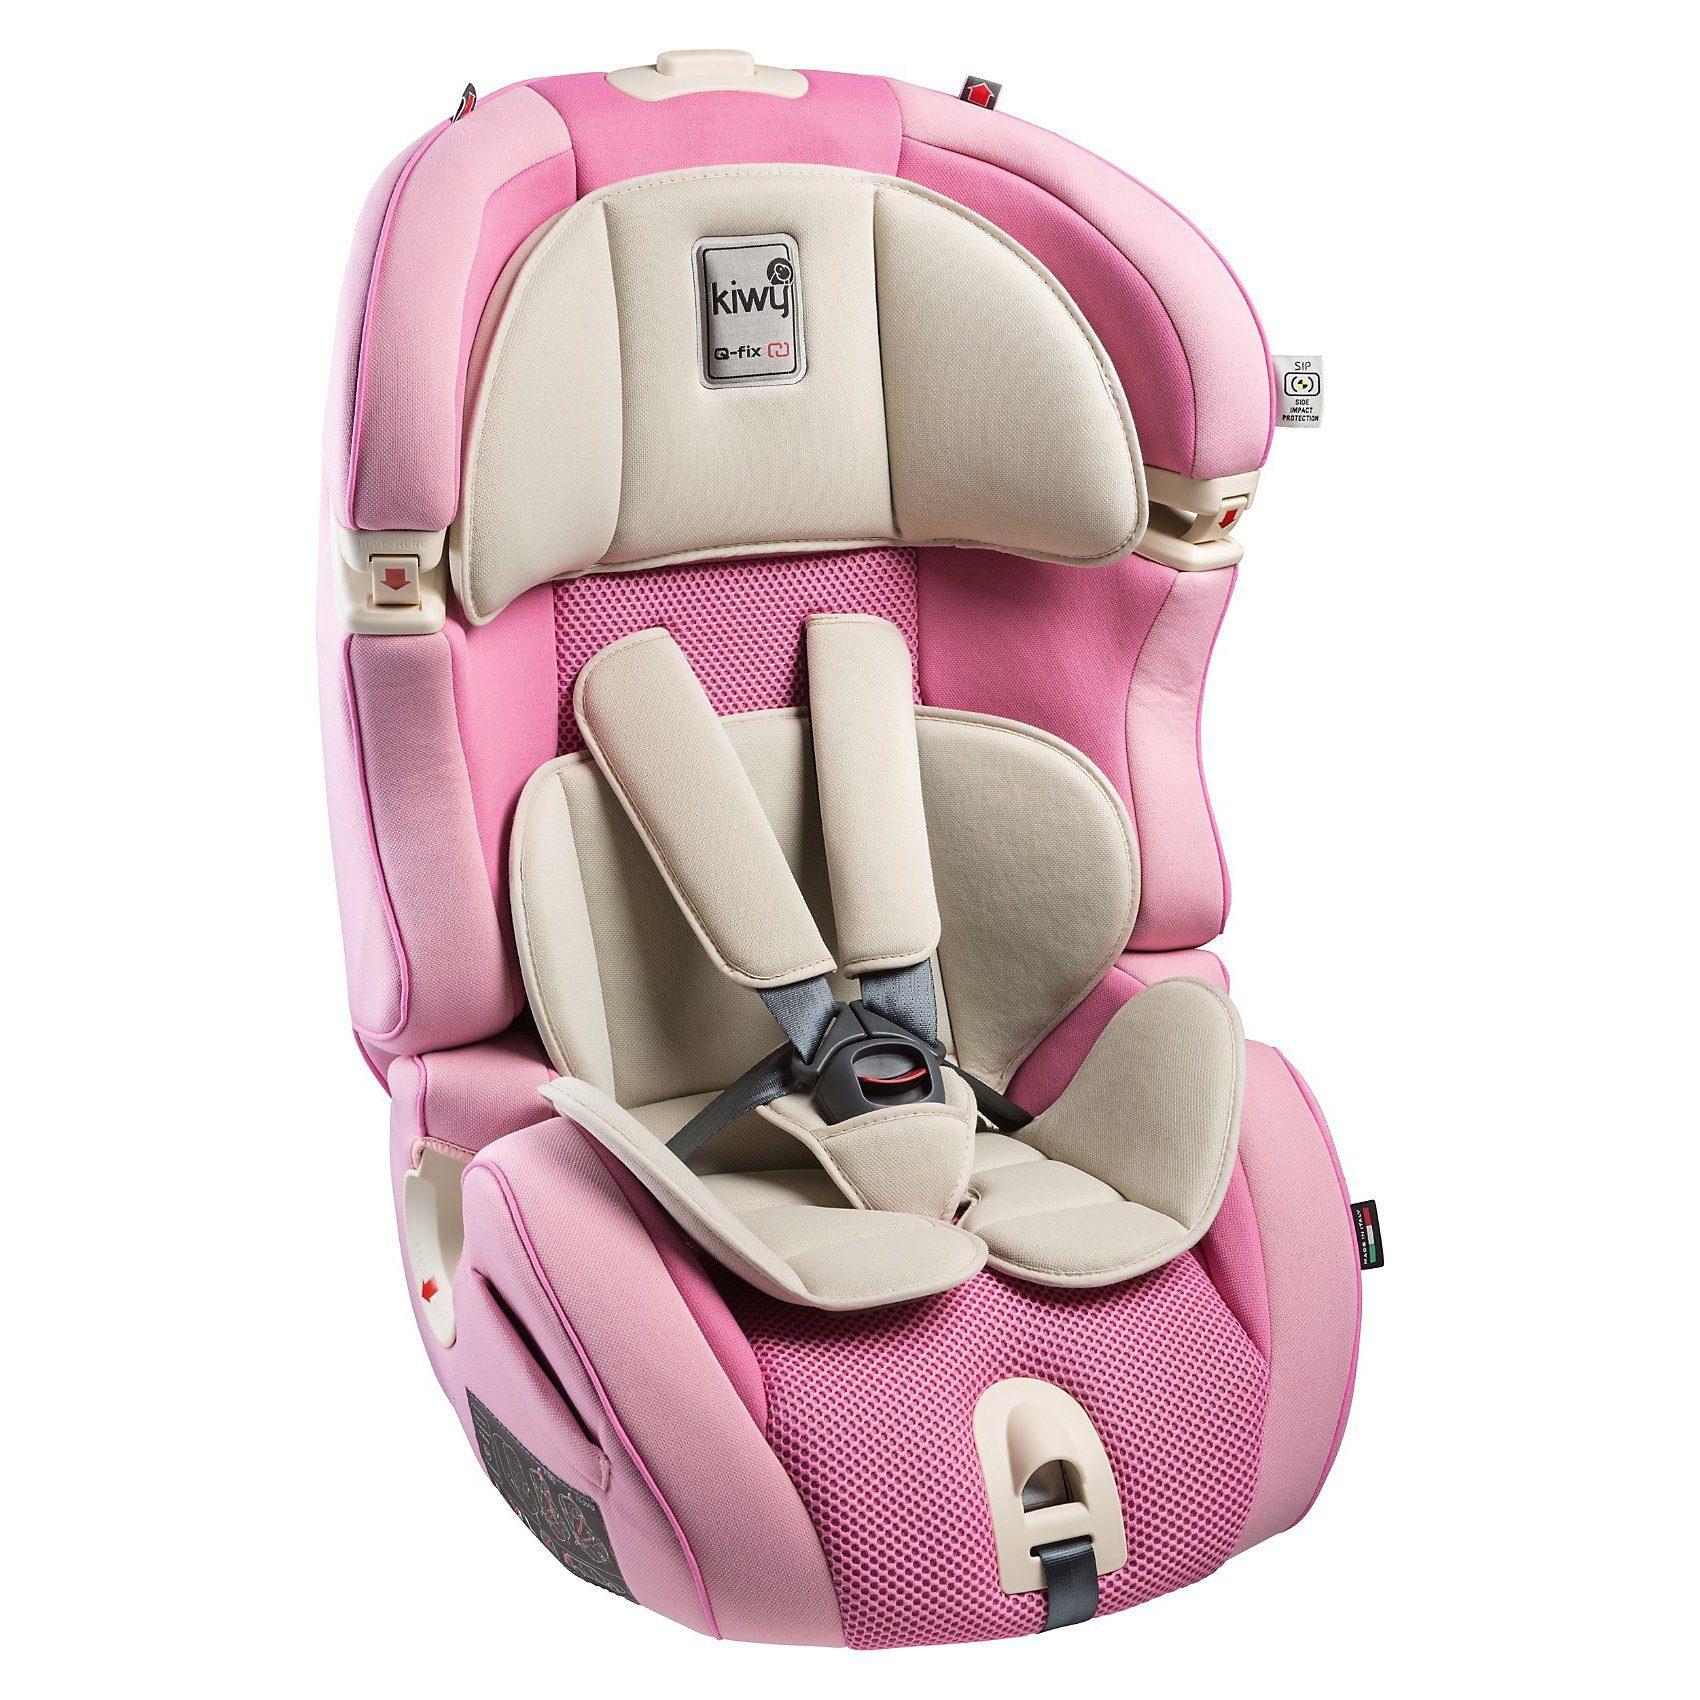 Kiwy Auto-Kindersitz SLF123 Q-Fix, Candy, 2016